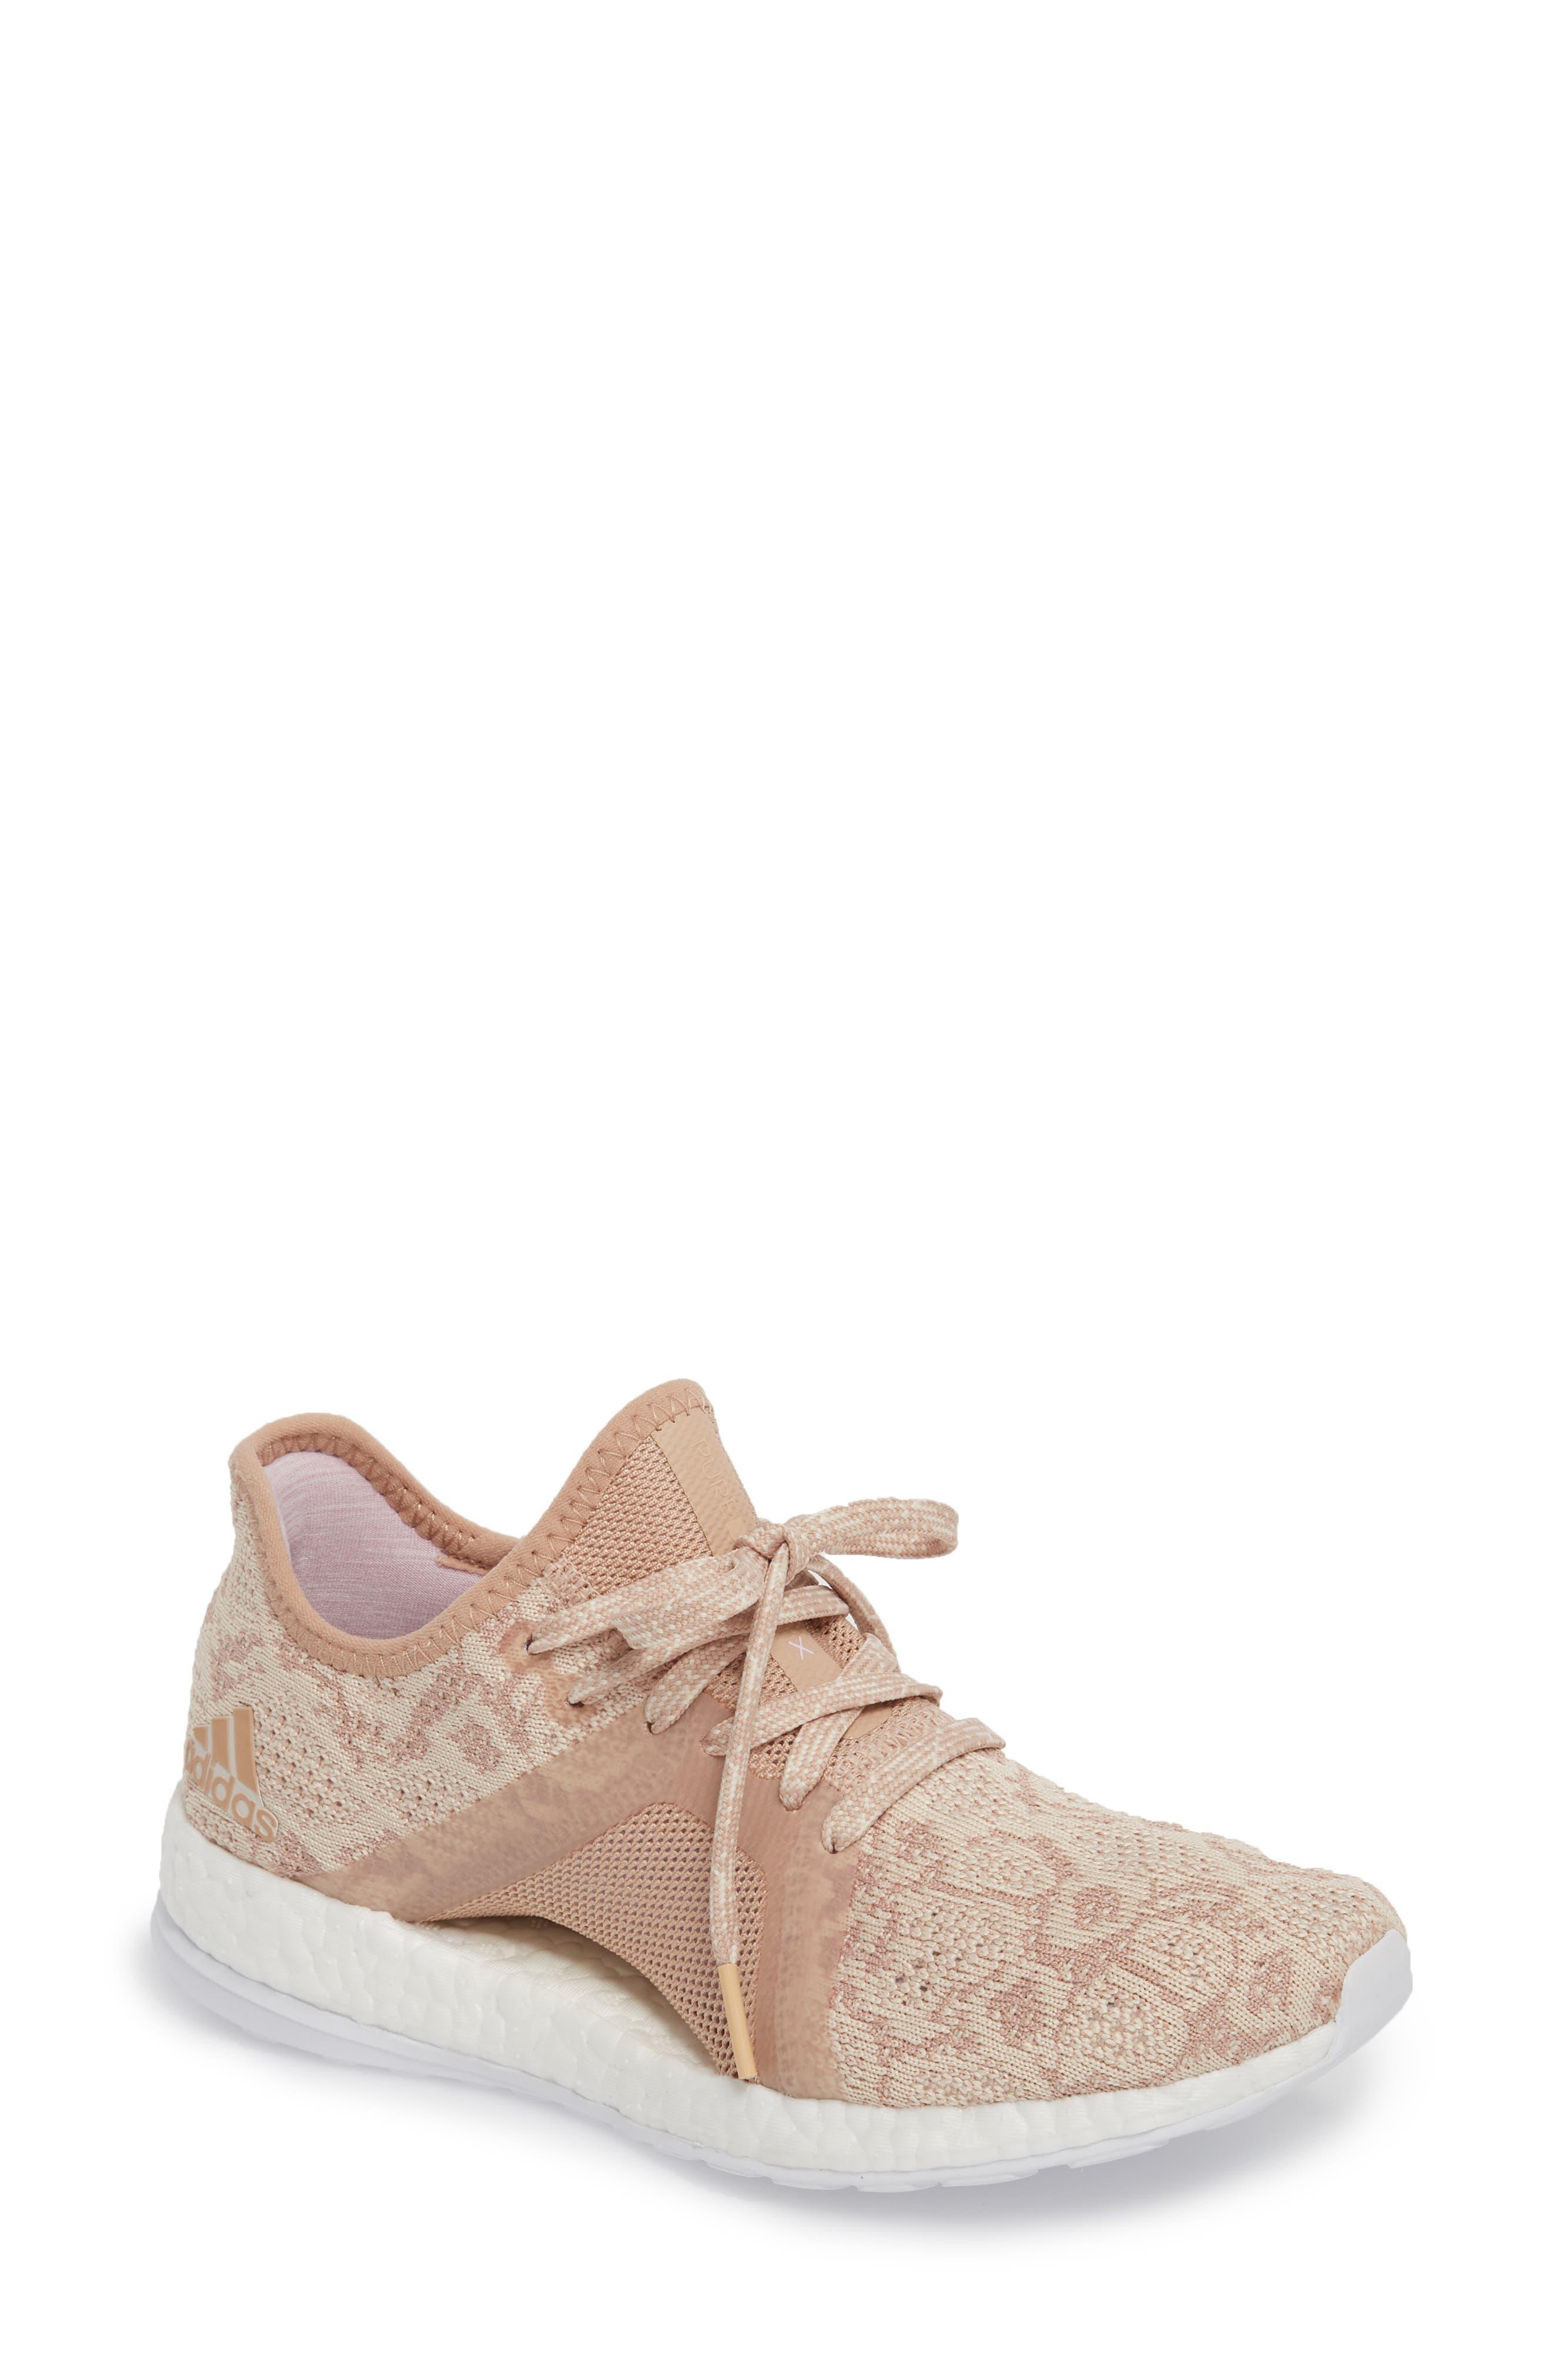 adidas PureBoost X Element Knit Running Shoe (Women)